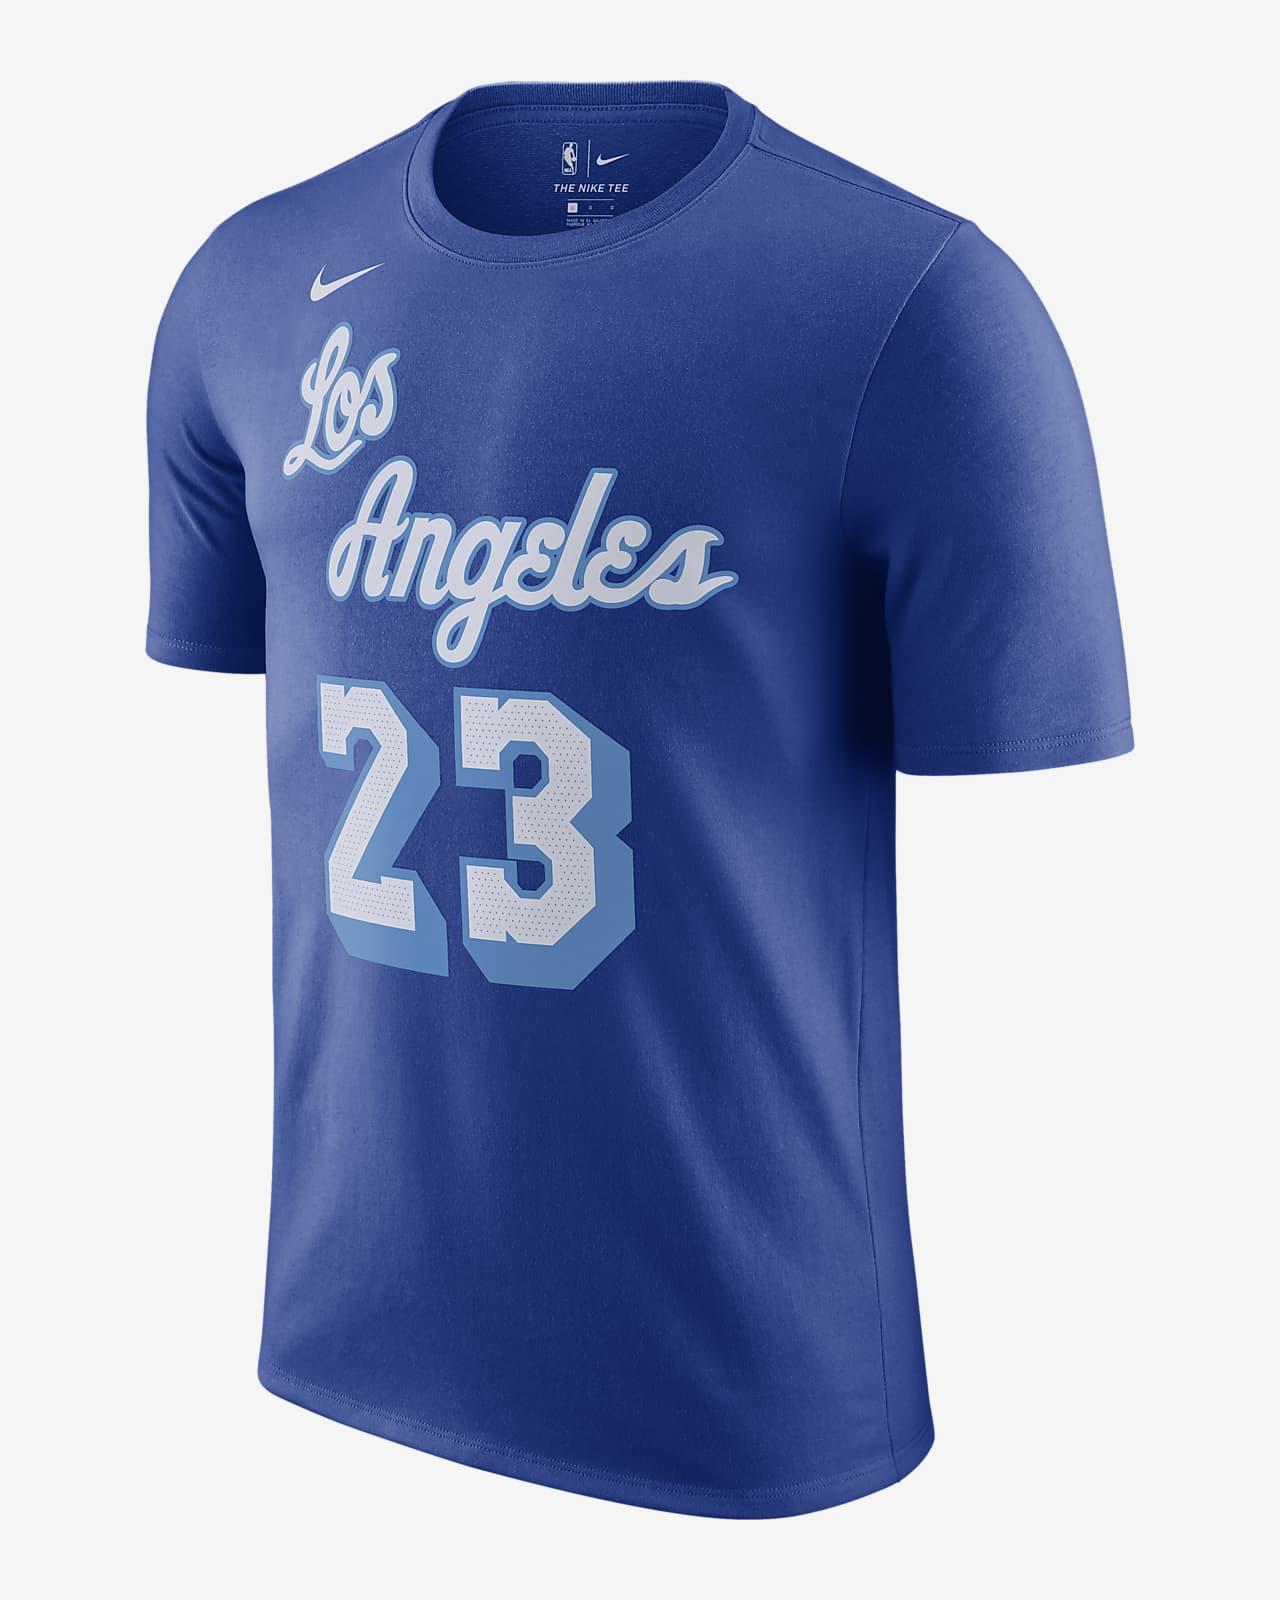 Los Angeles Lakers Classic Edition Men's Nike NBA T-Shirt